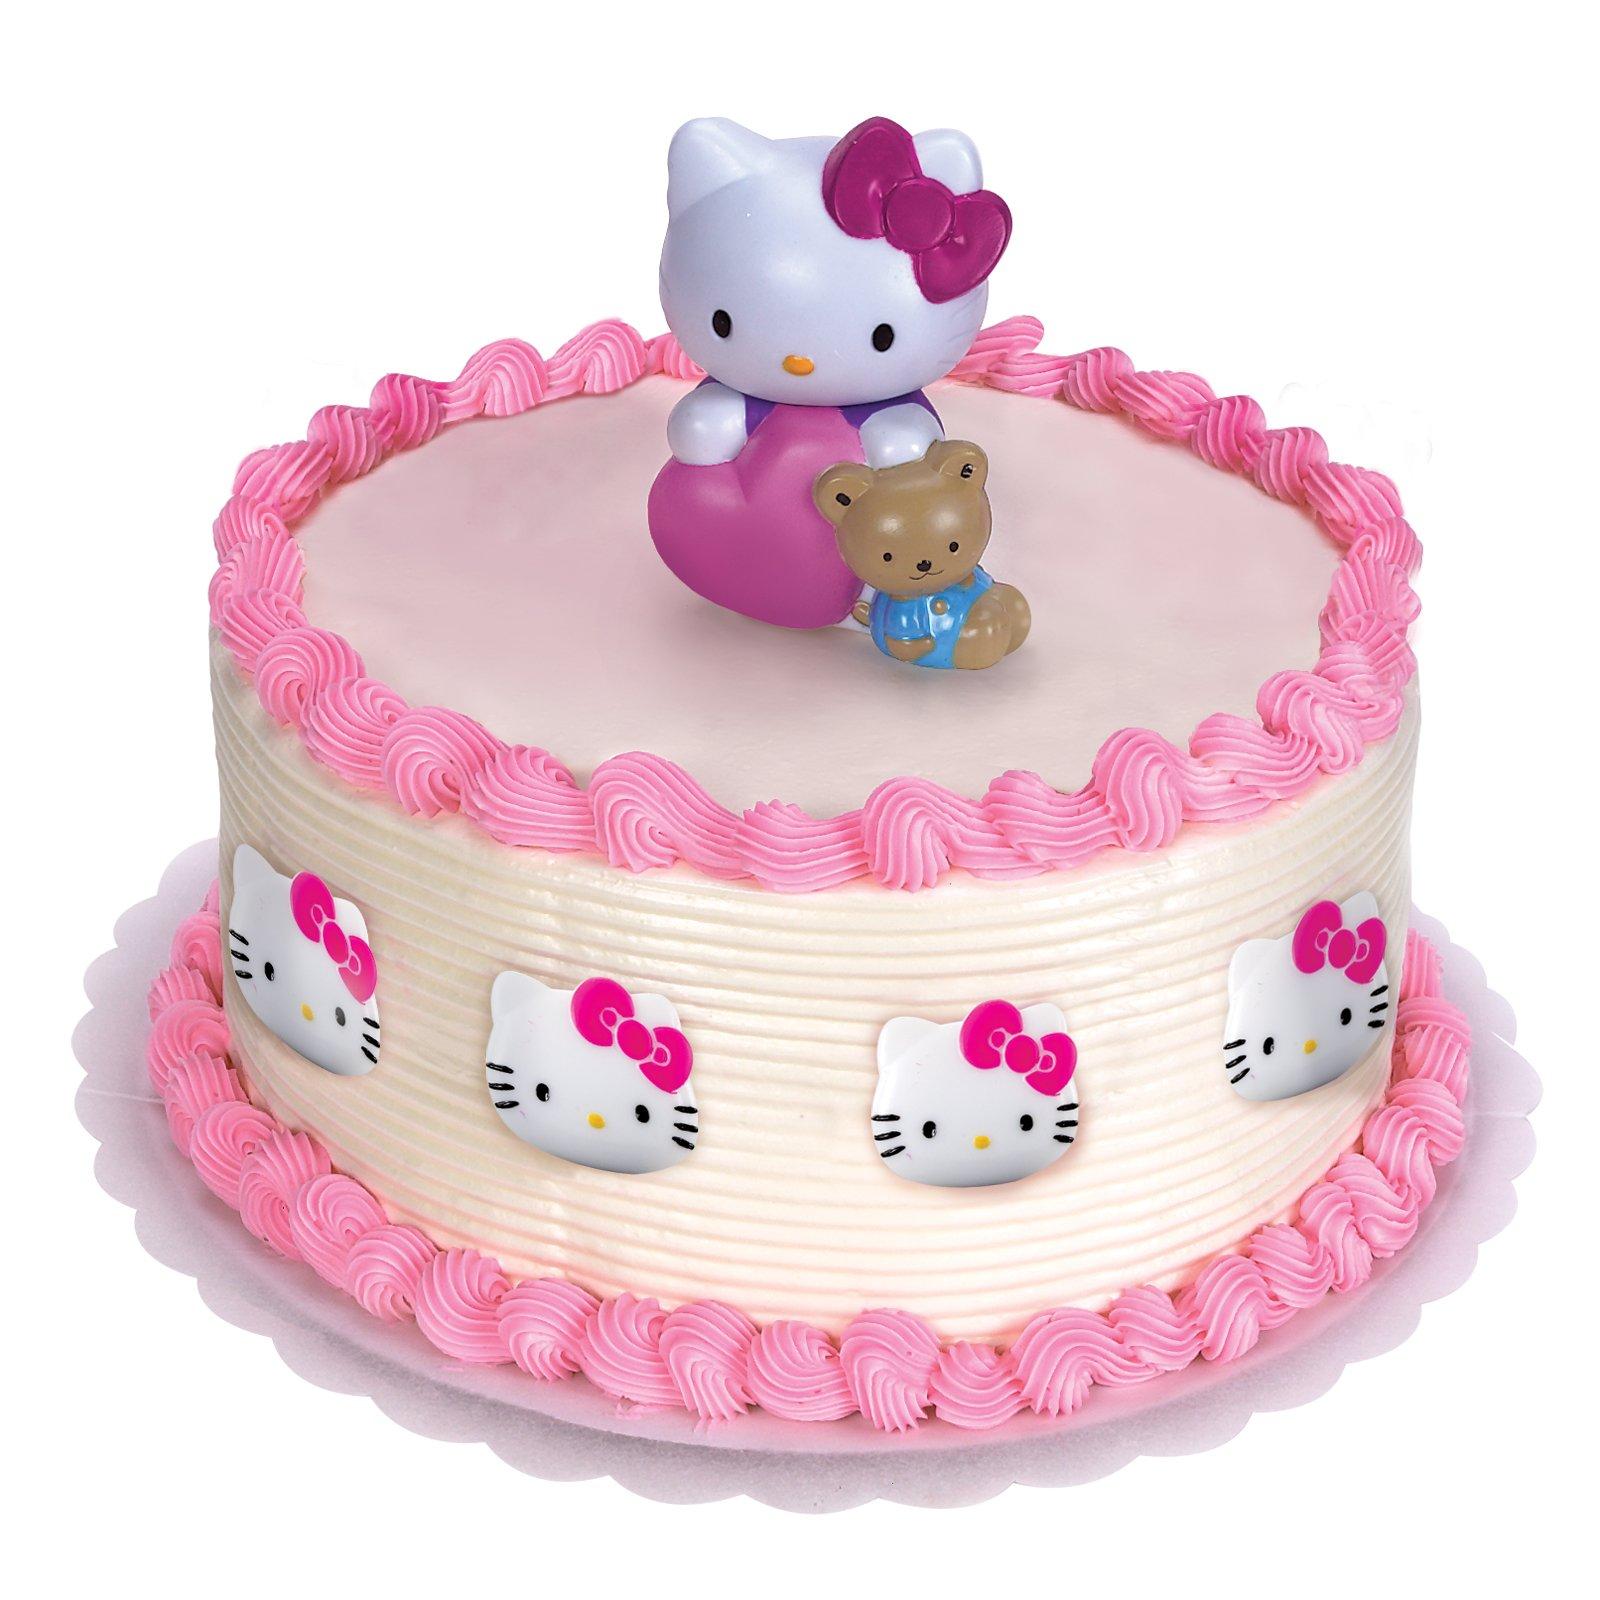 ... de torta para bautismo para nena zona adorno decoracin de torta de